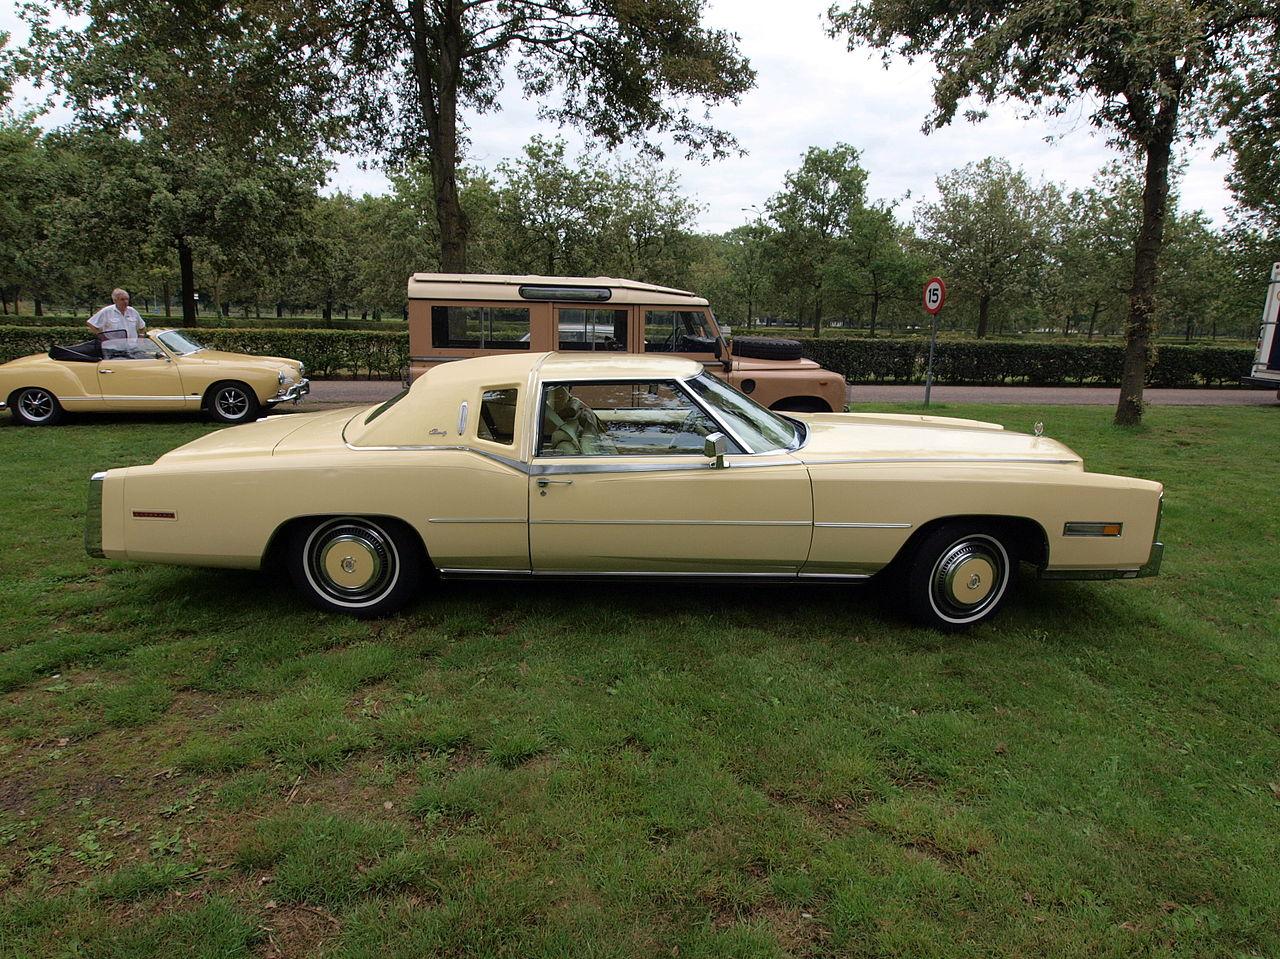 1976 Cadillac Superior Soveriegn Regal Landaulet Hearse